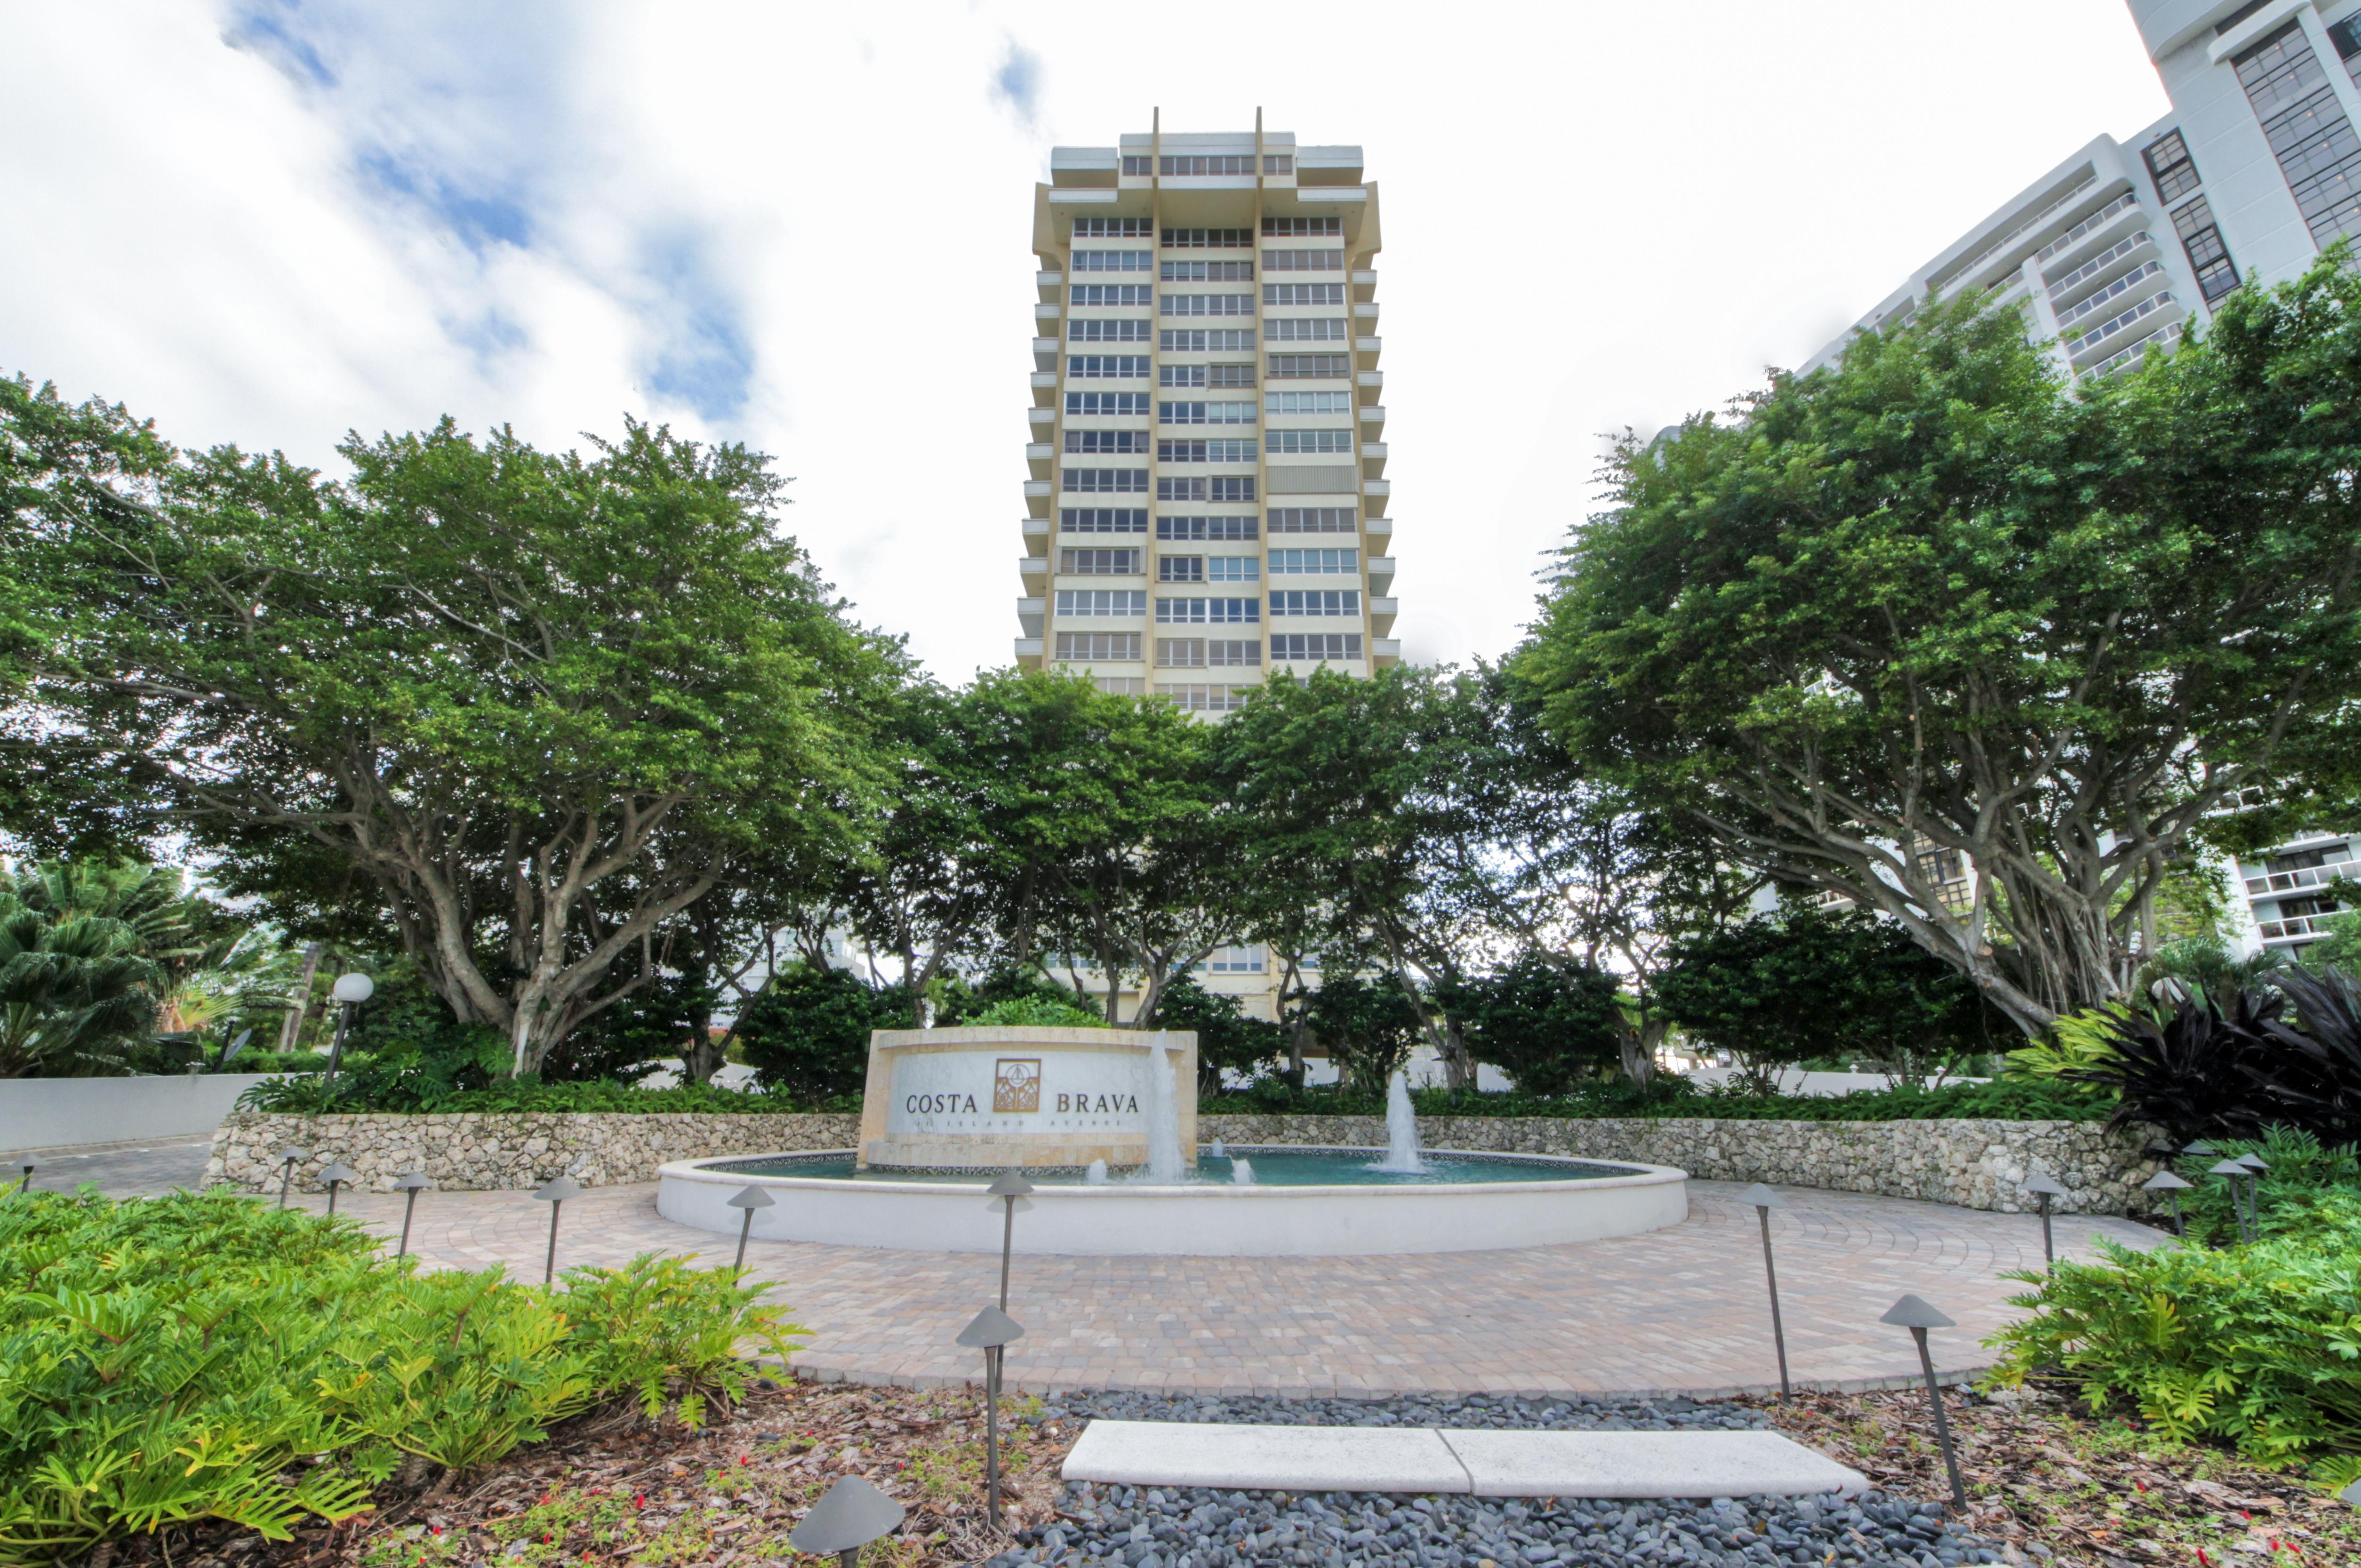 Condominium for Sale at 11 Island Ave #511 11 Island Ave 511 Miami Beach, Florida, 33139 United States